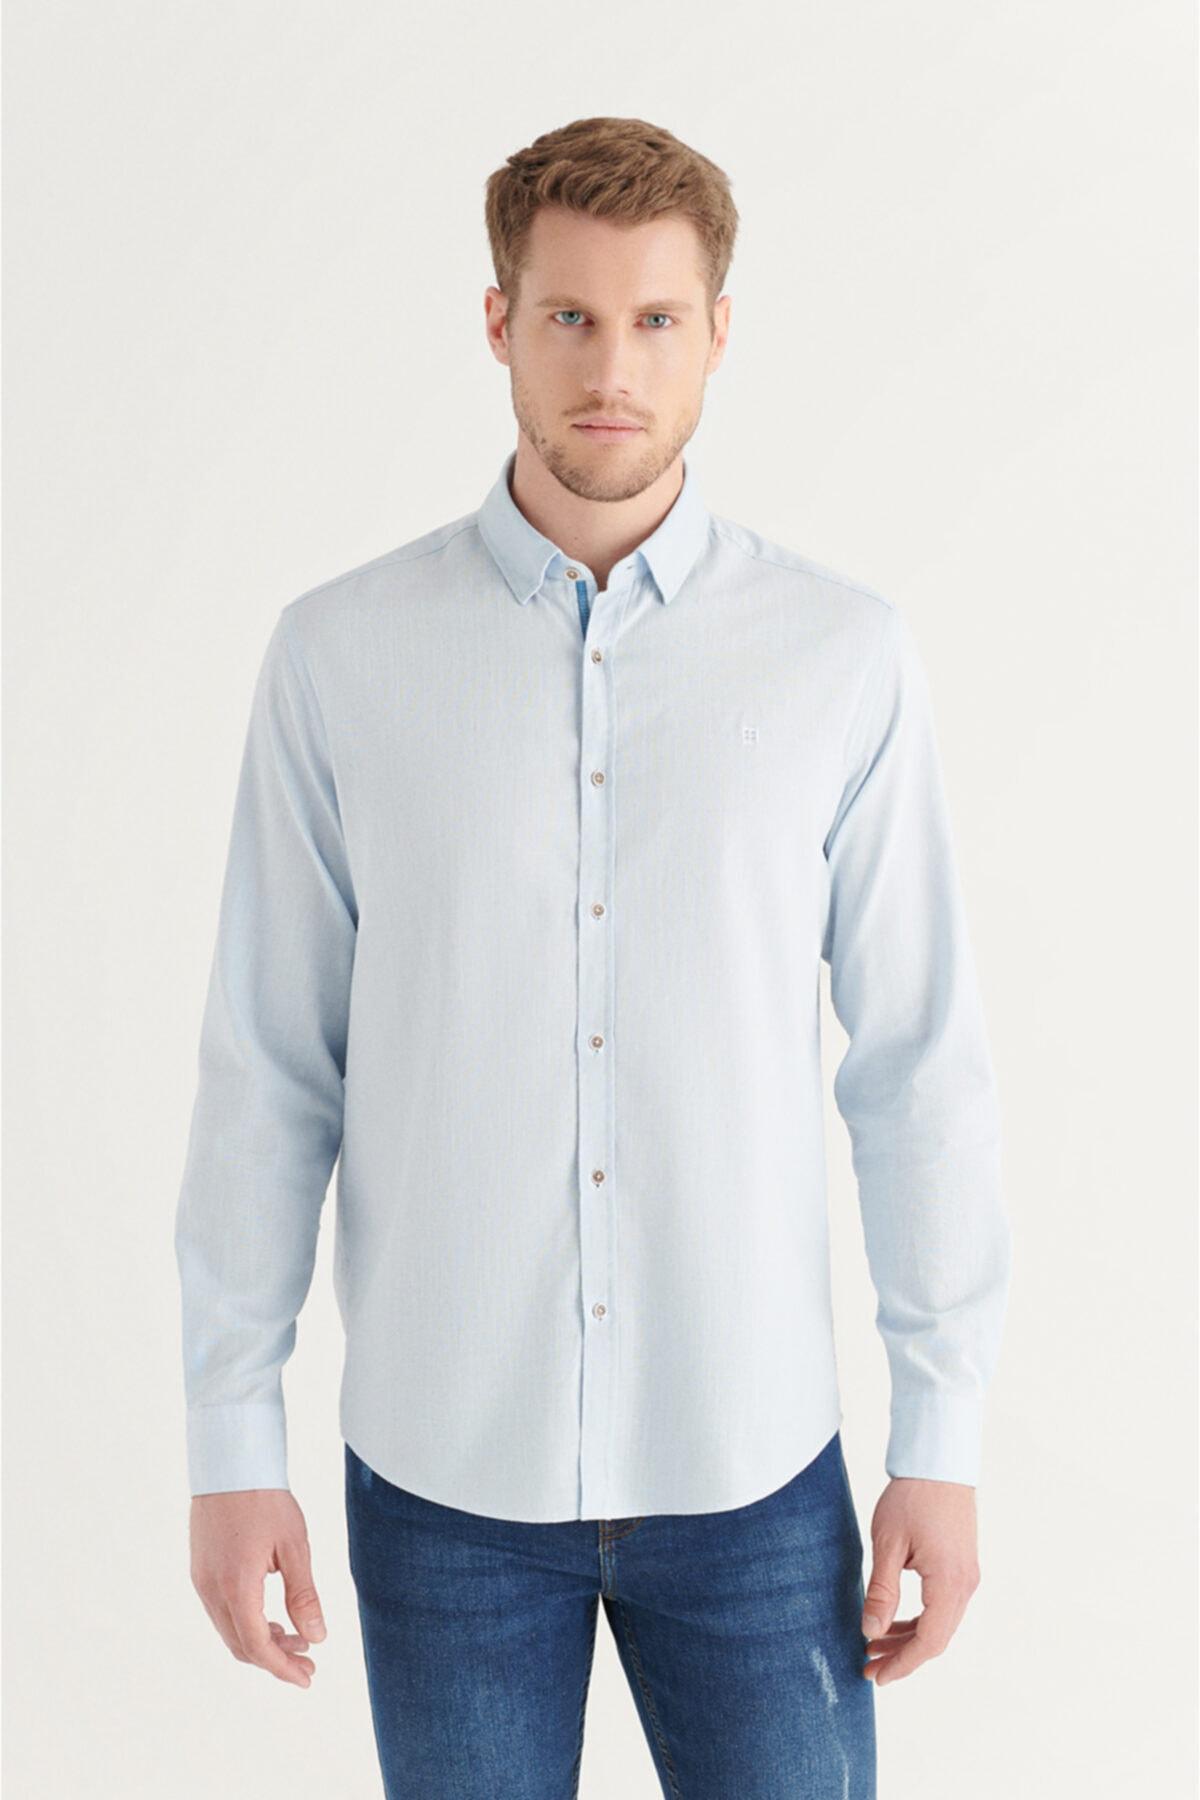 Erkek Açık Mavi Düz Alttan Britli Yaka Regular Fit Gömlek A11y2141